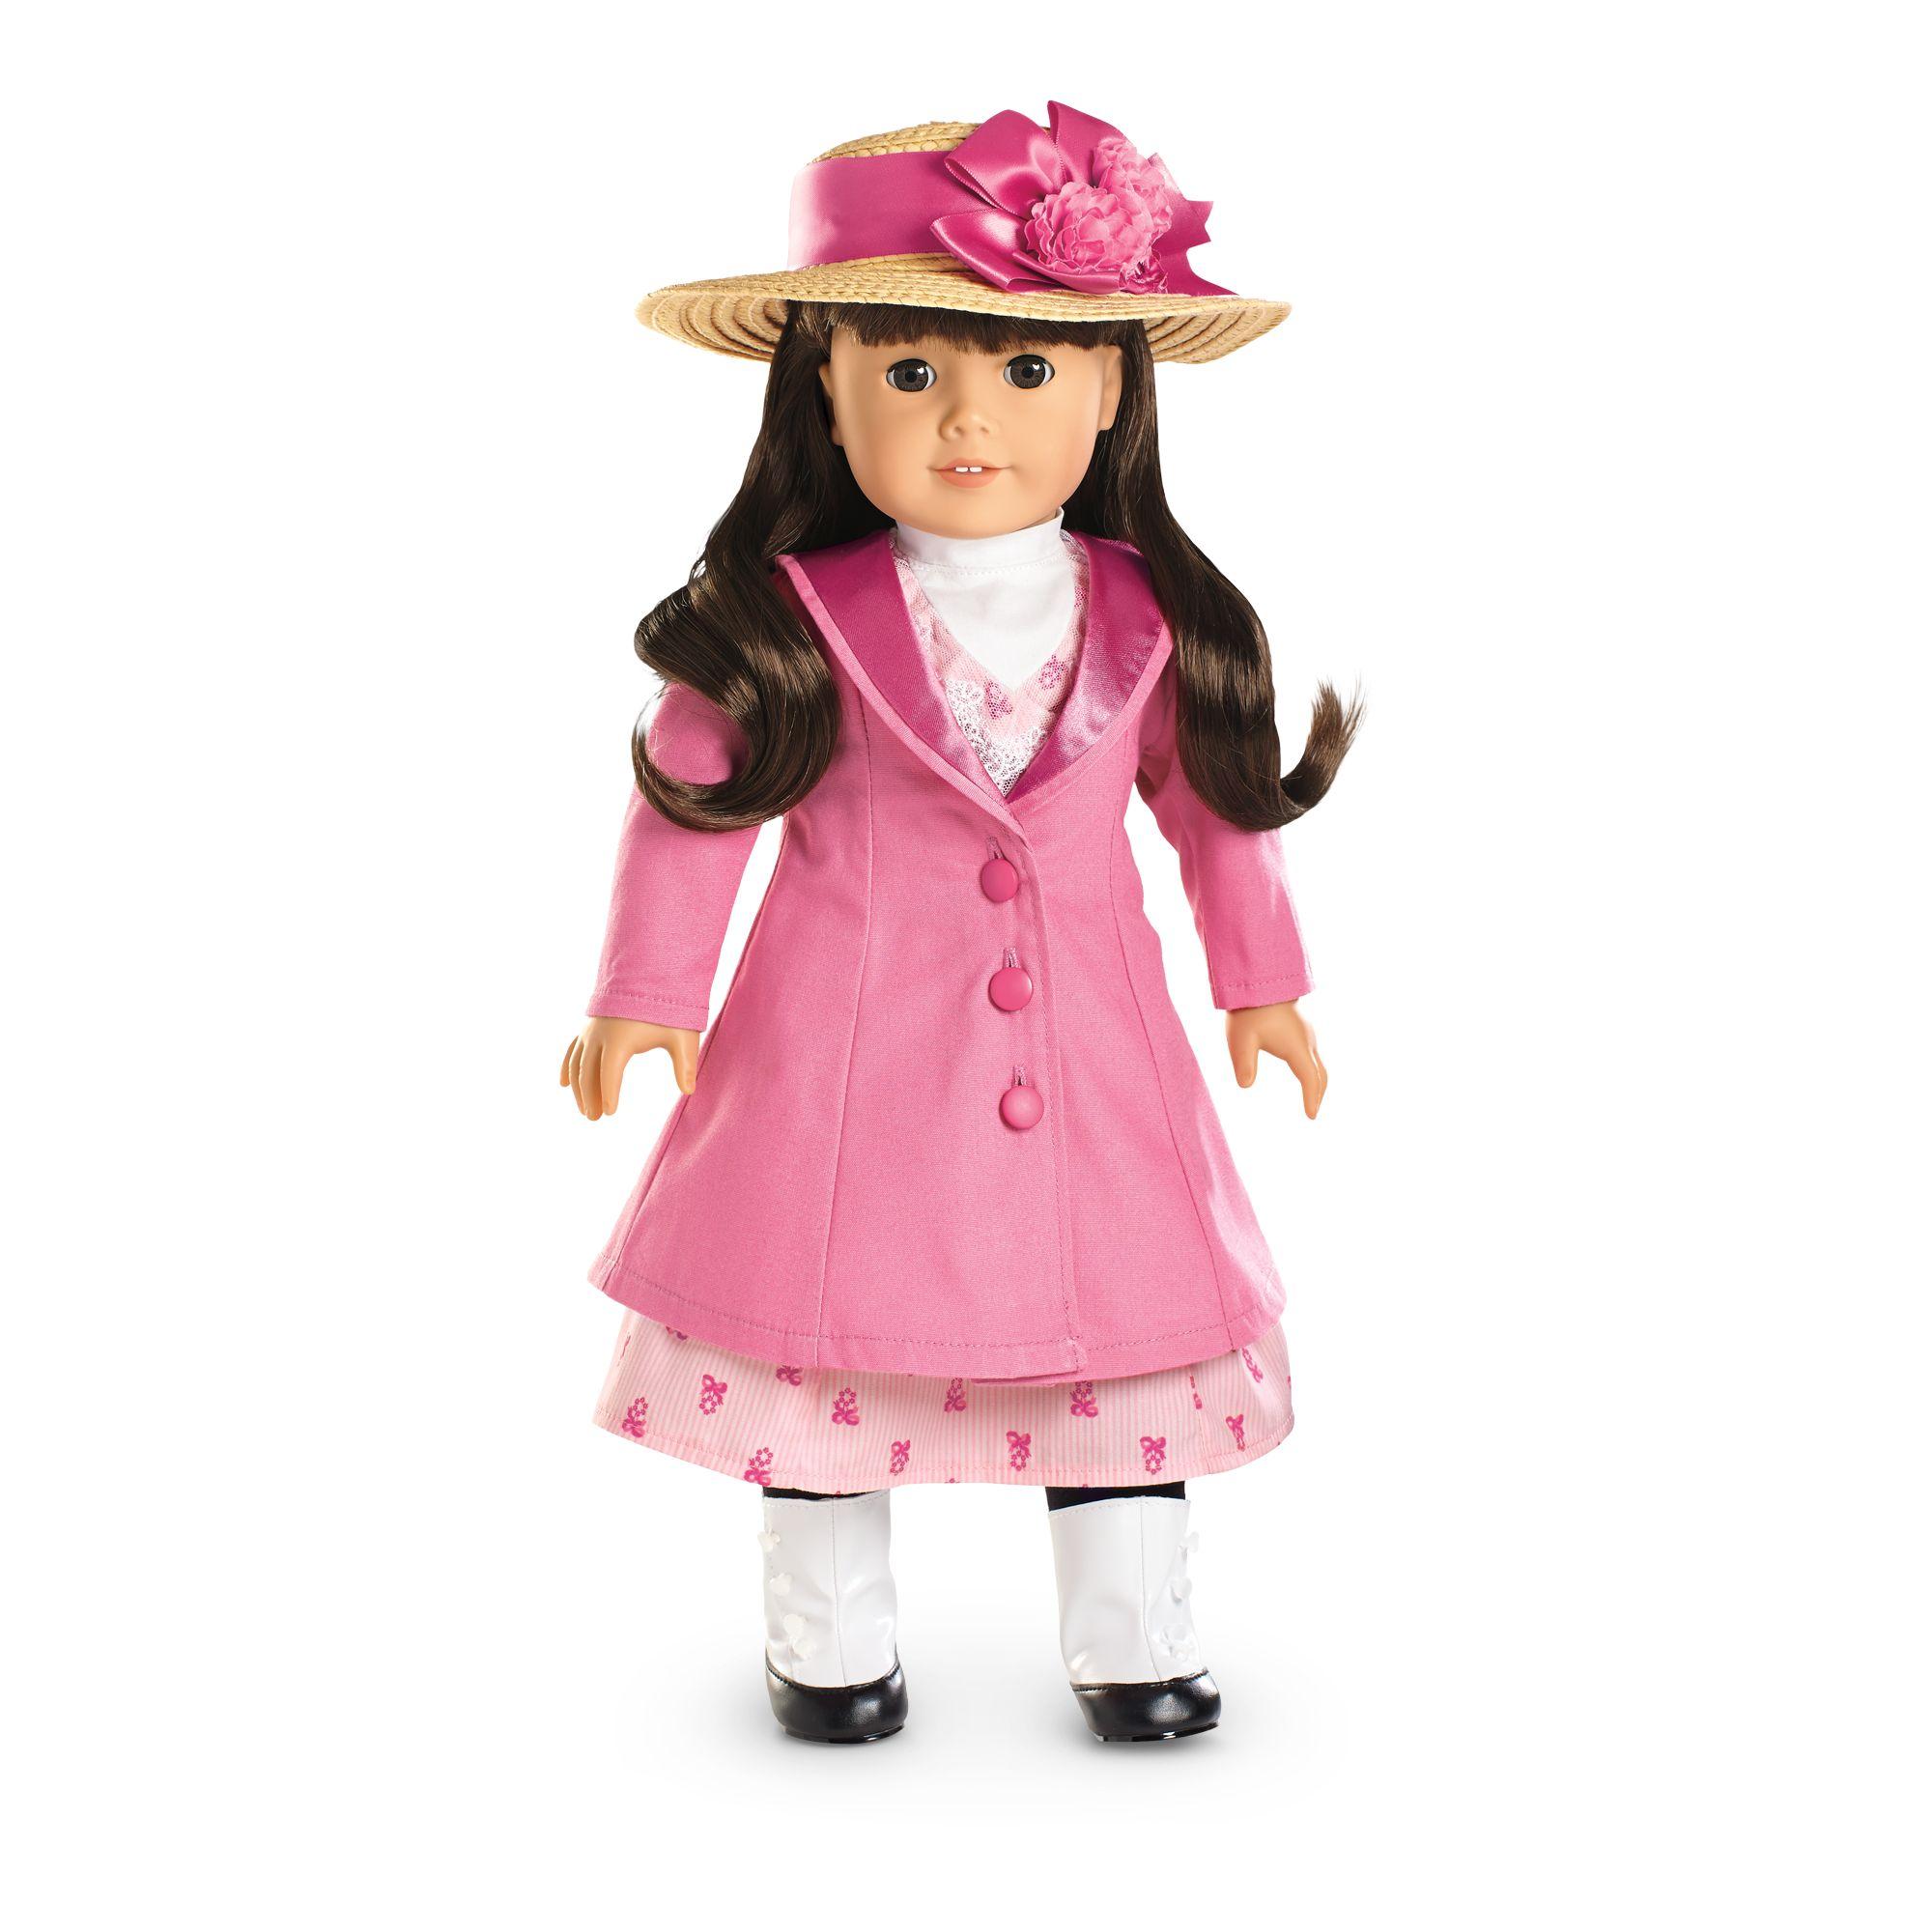 Samantha's Travel Coat and Hat